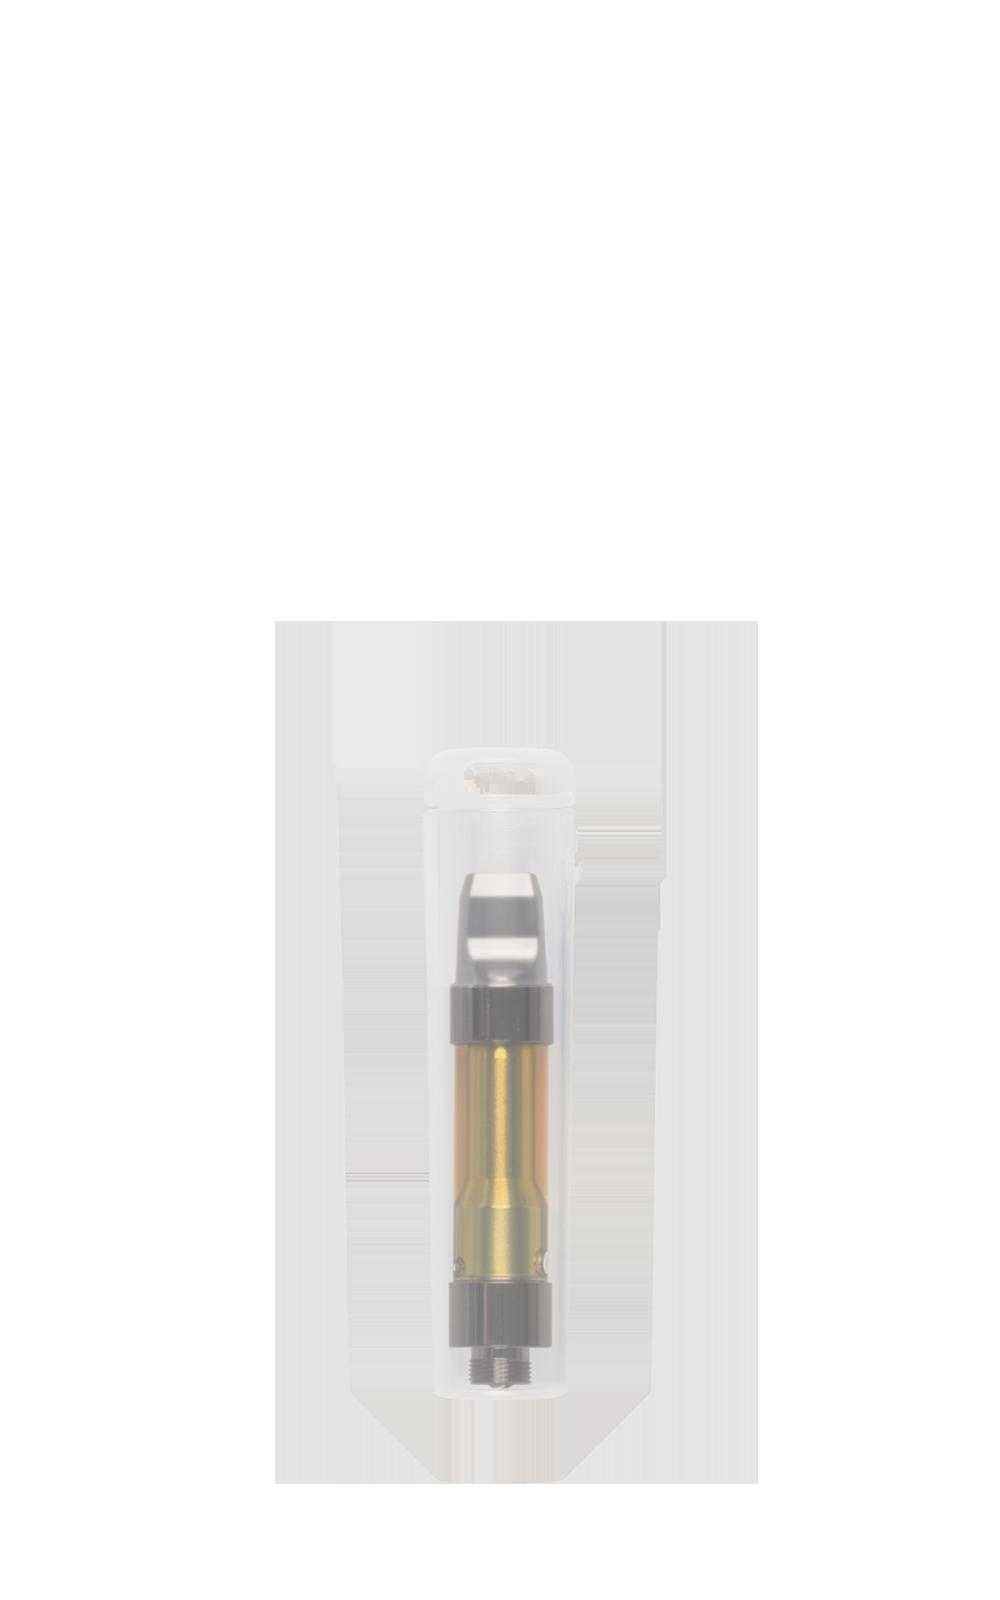 crpak-tube-70-Side-Cartridge.png